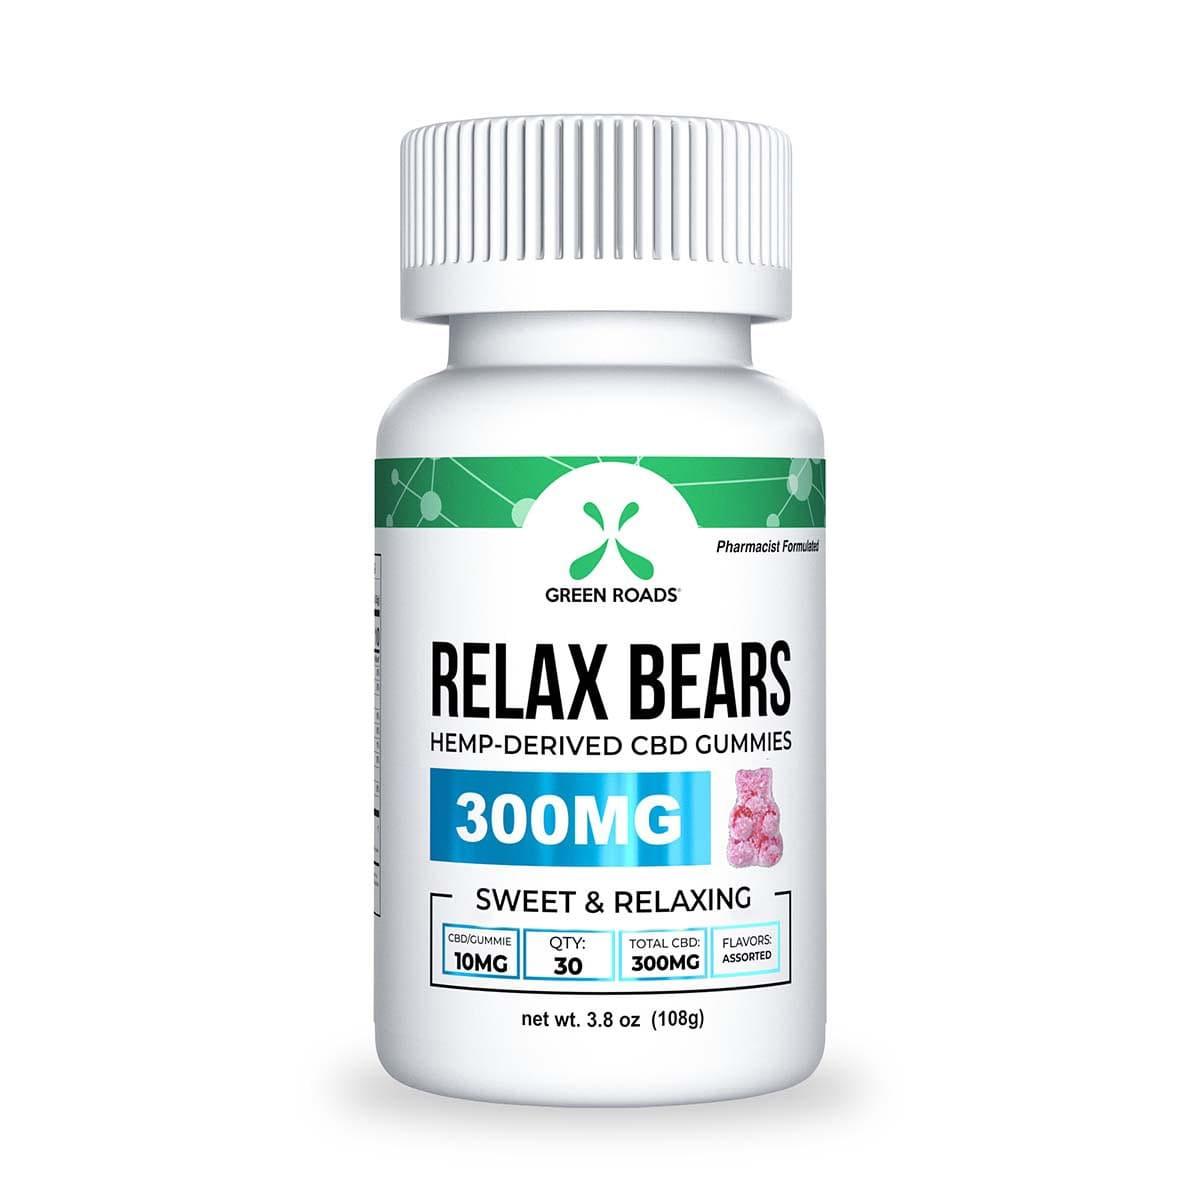 Green Roads CBD Gummy Bears - 300mg (10mg CBD per gummy) - 3,8oz